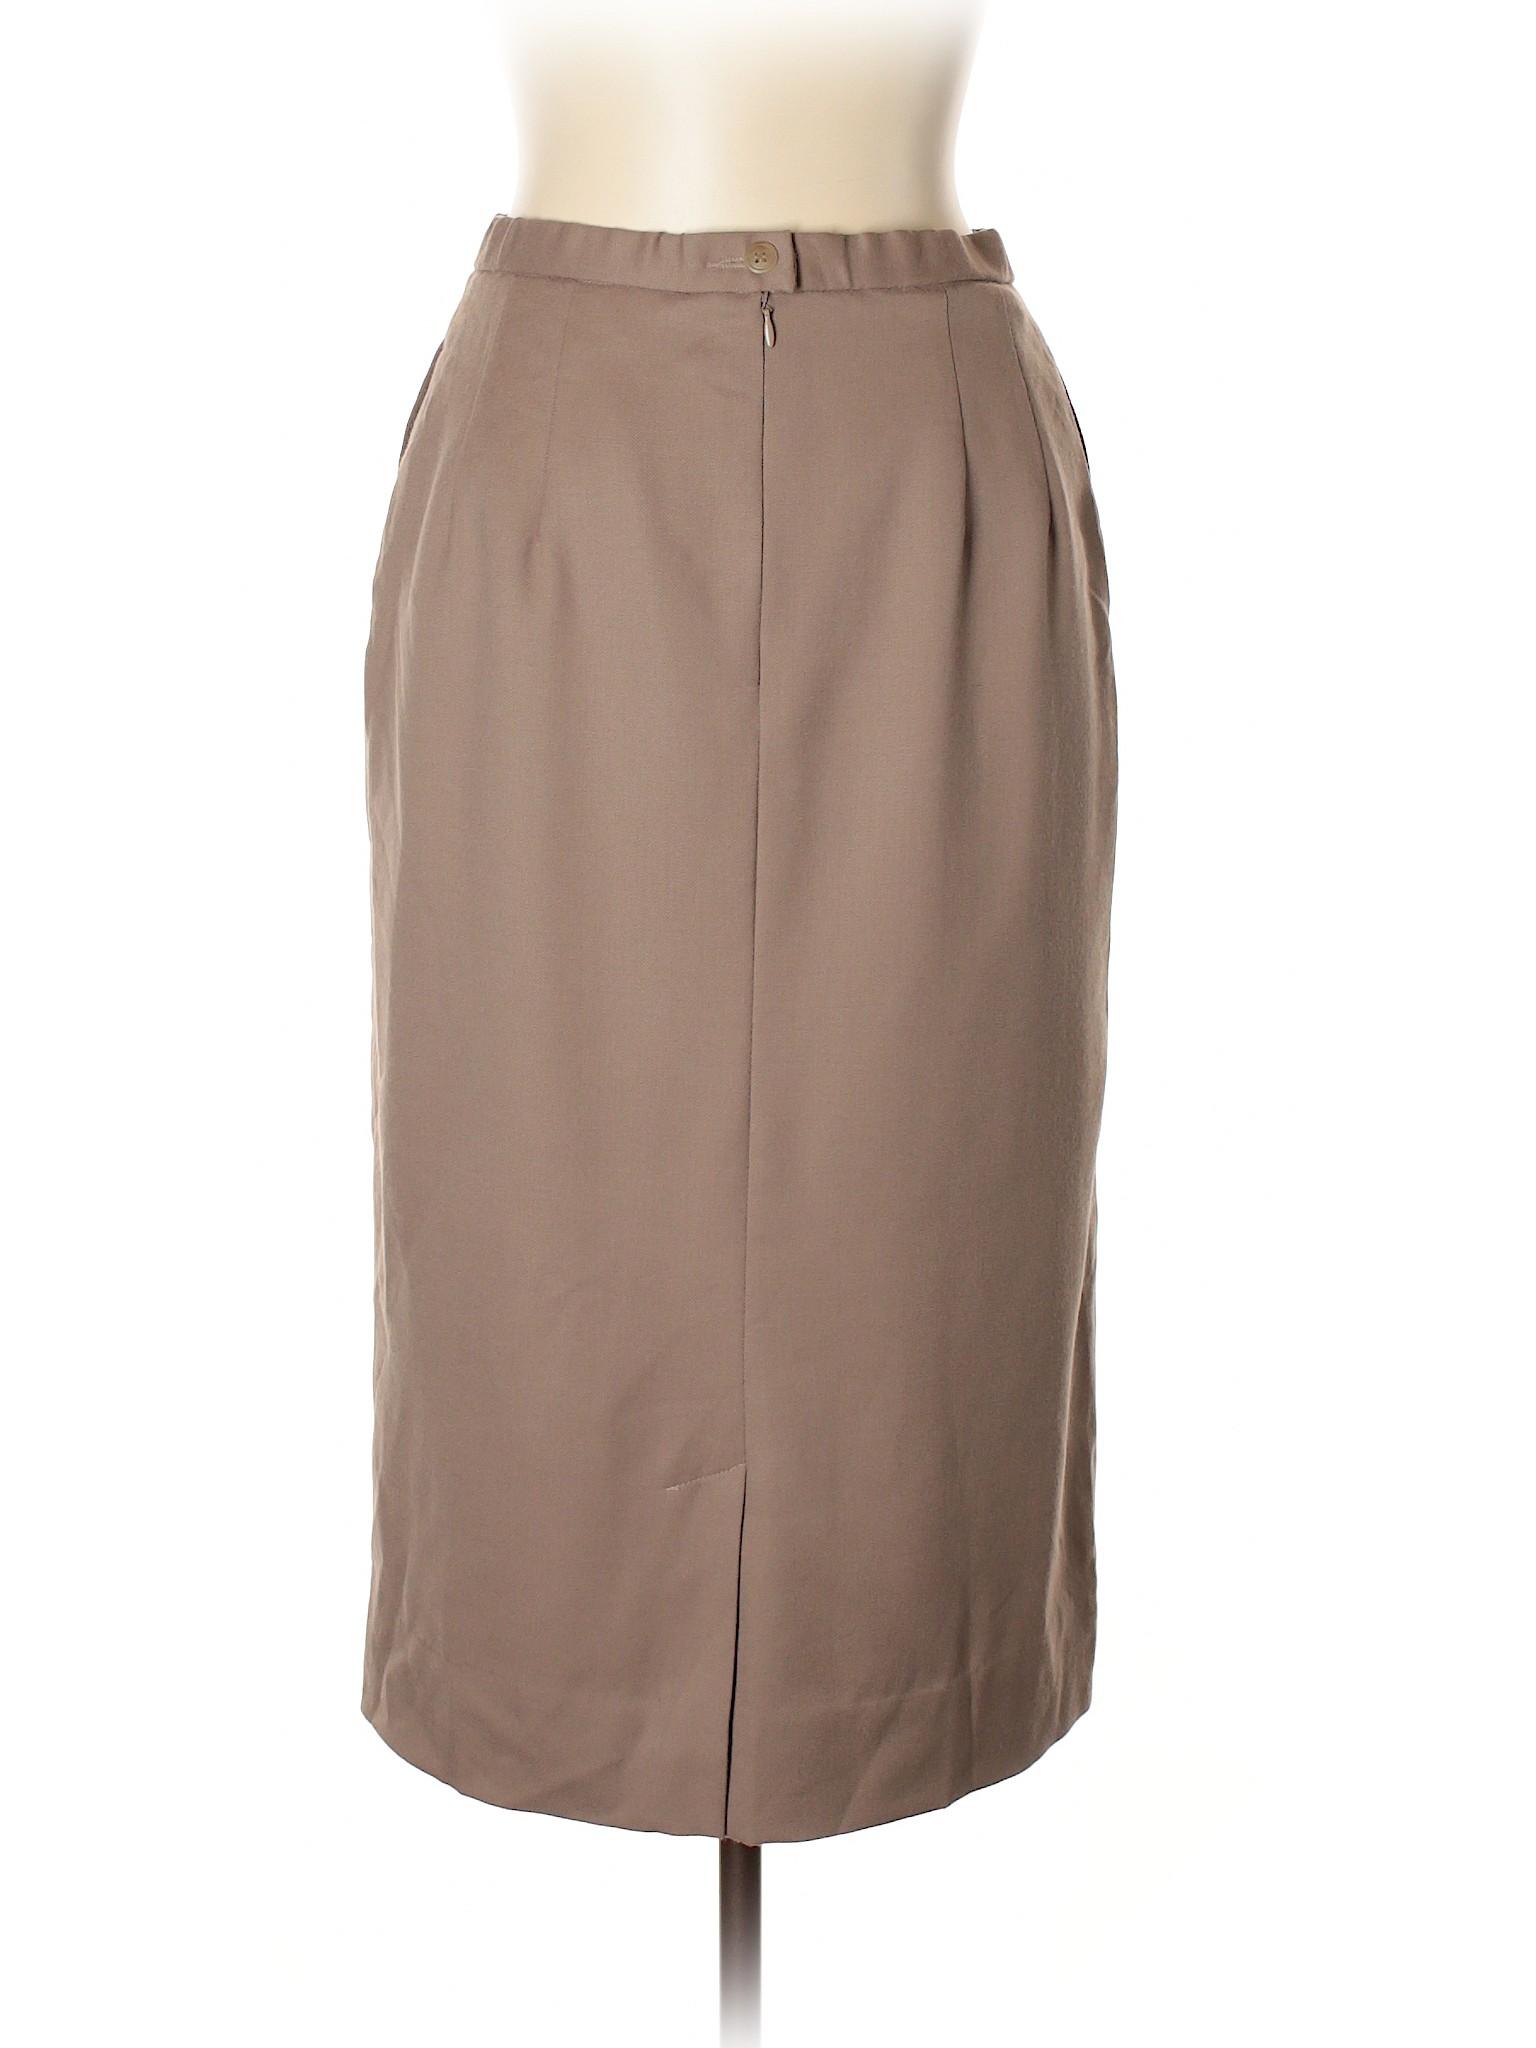 Boutique Pendleton Wool Boutique Skirt Pendleton xwq4YSxvg